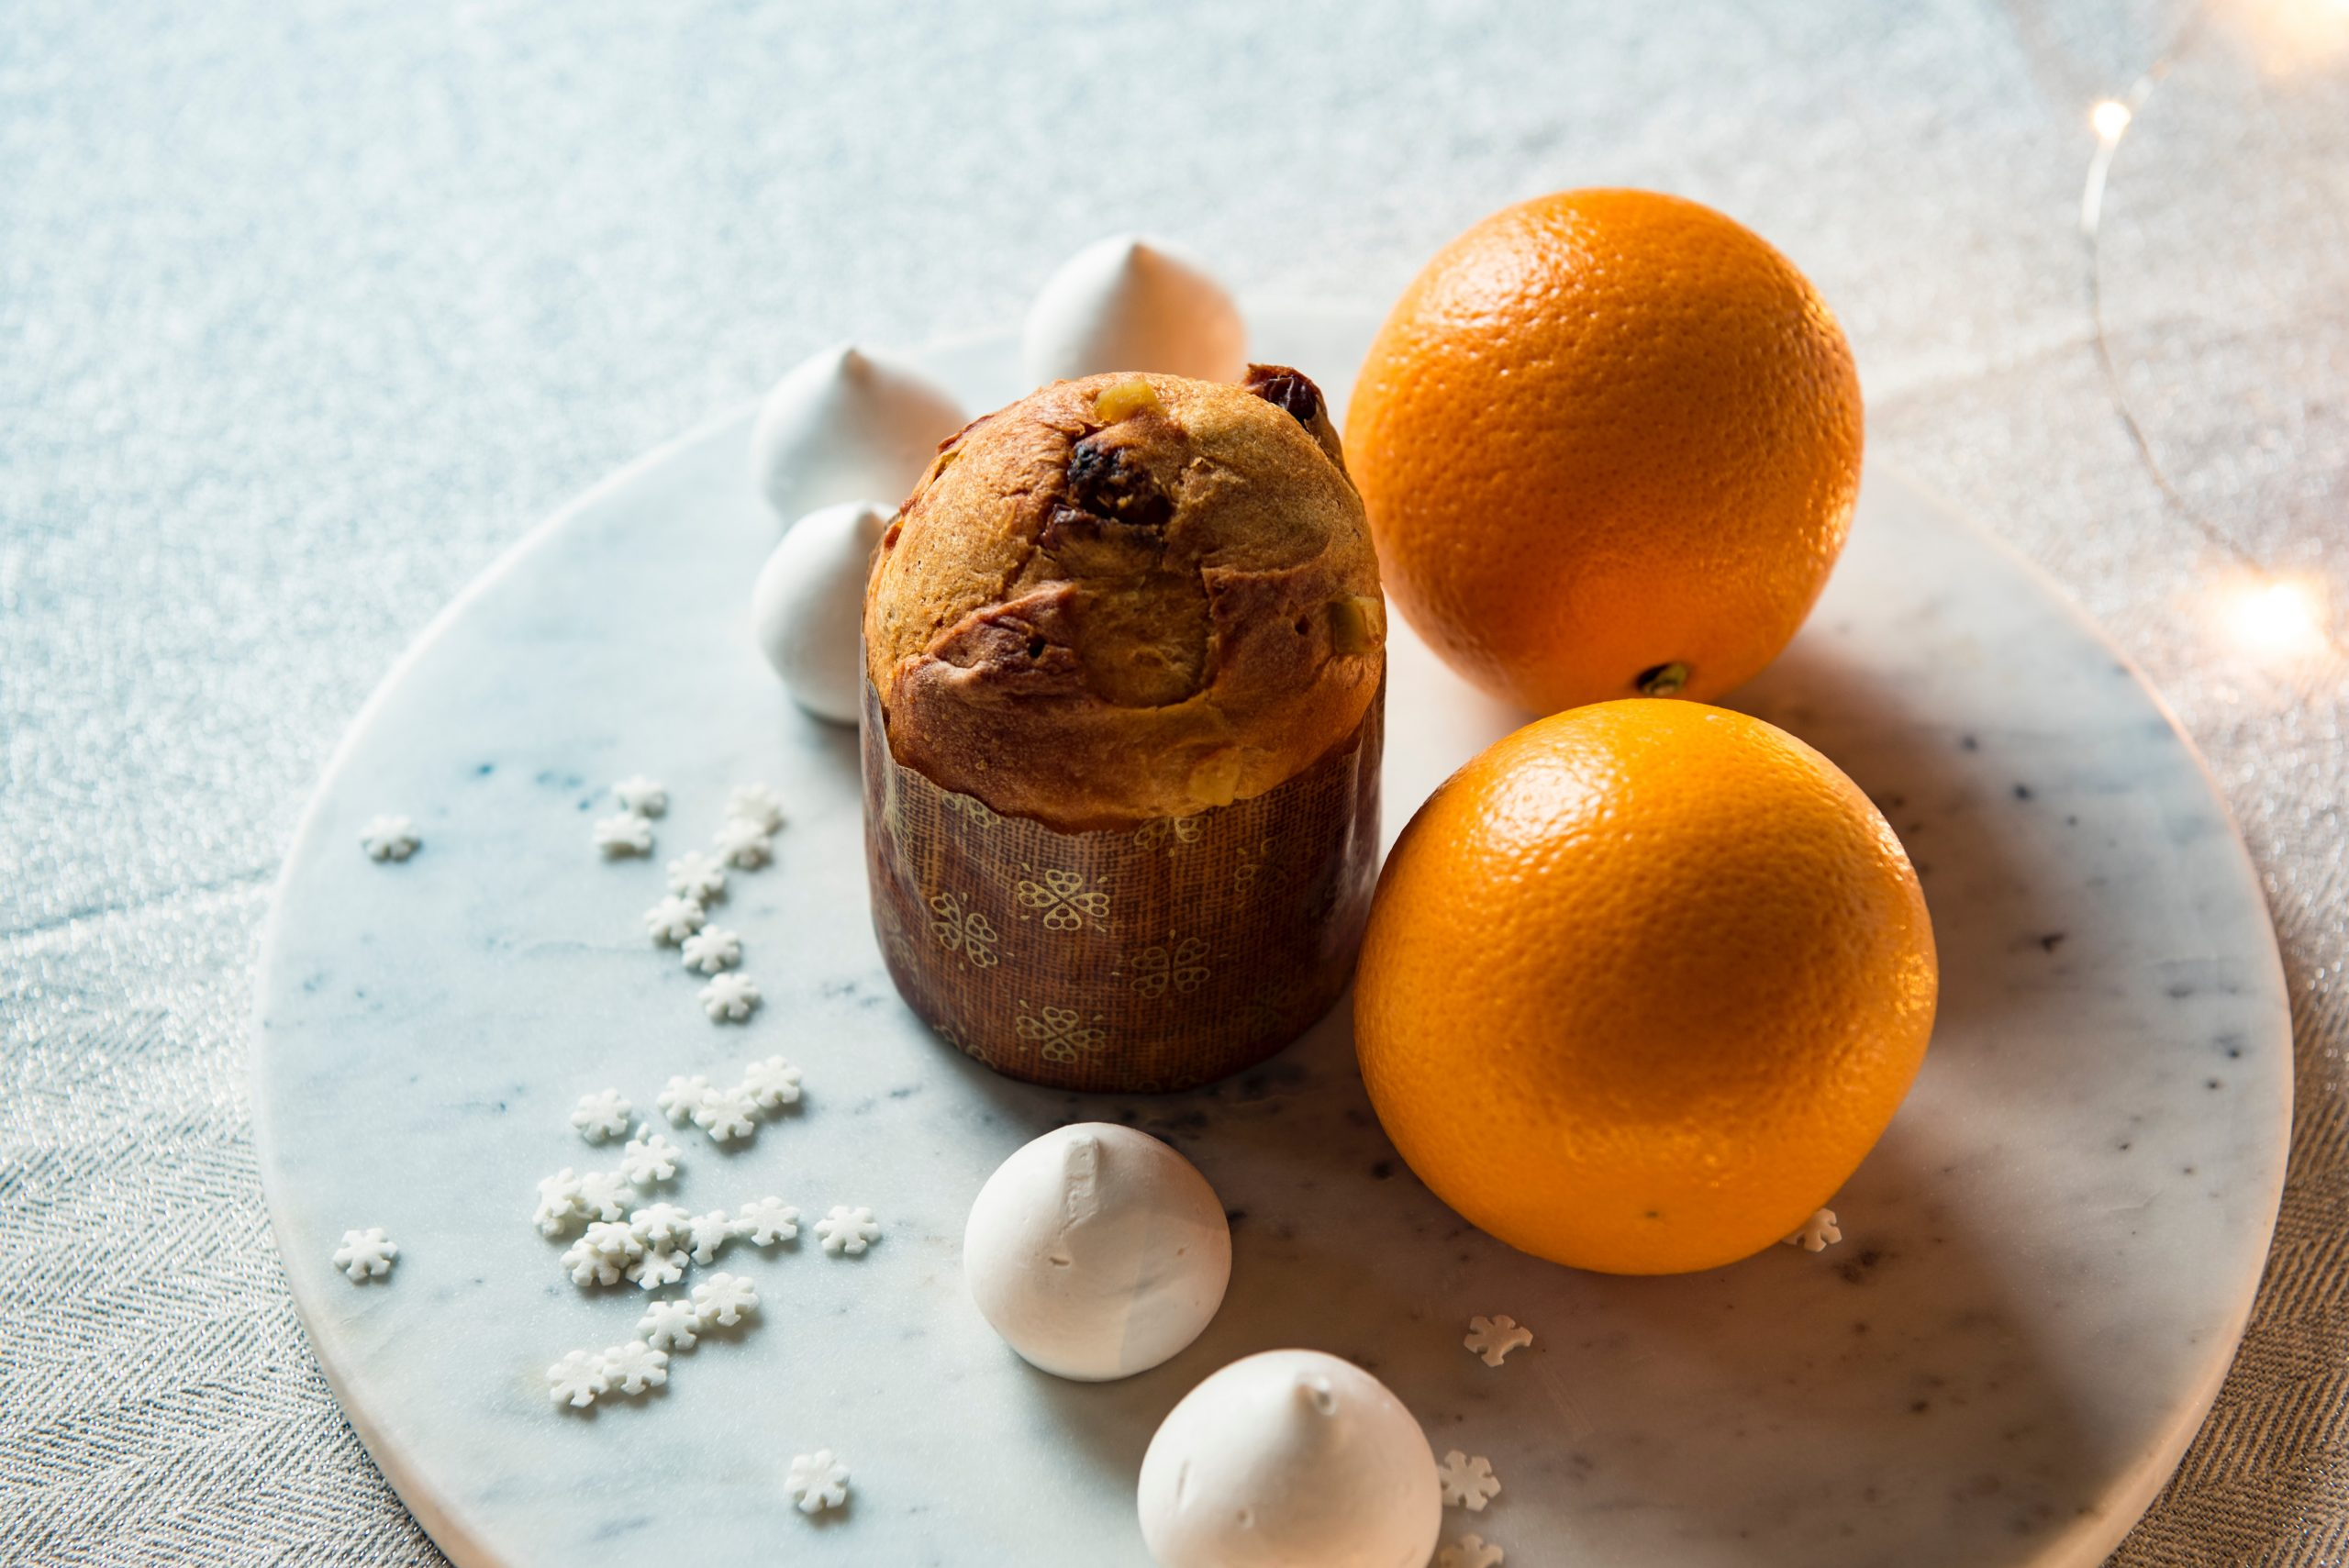 two orange fruits on white plate